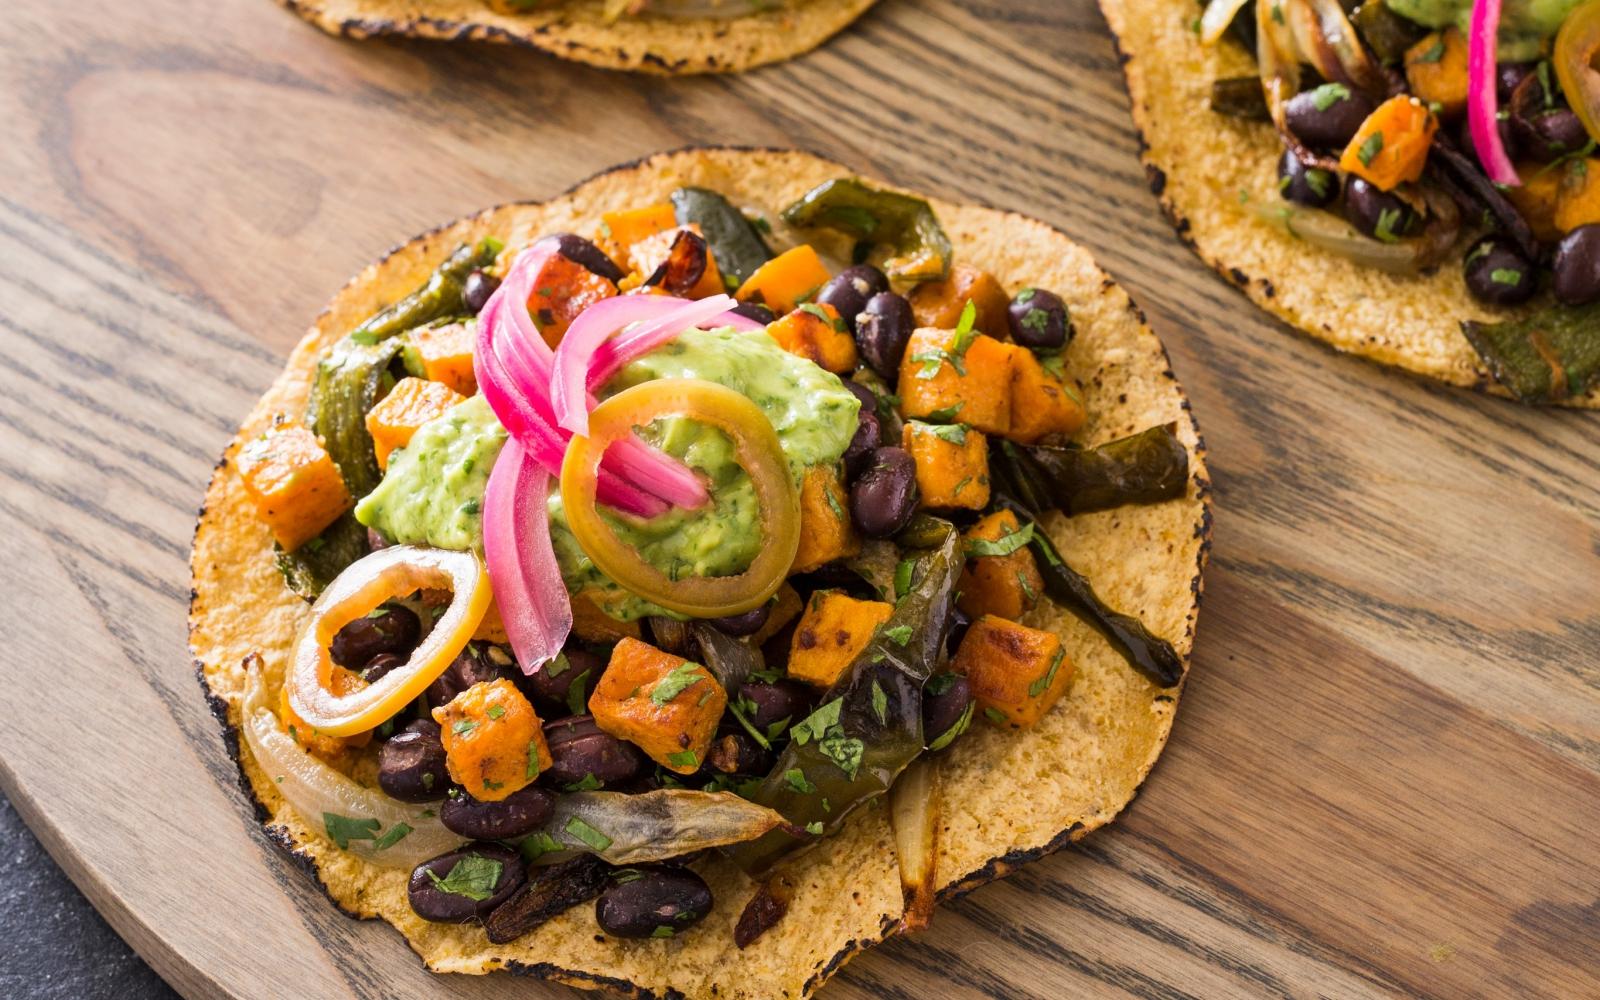 Vegan Sweet Potato, Poblano, and Black Bean Tacos